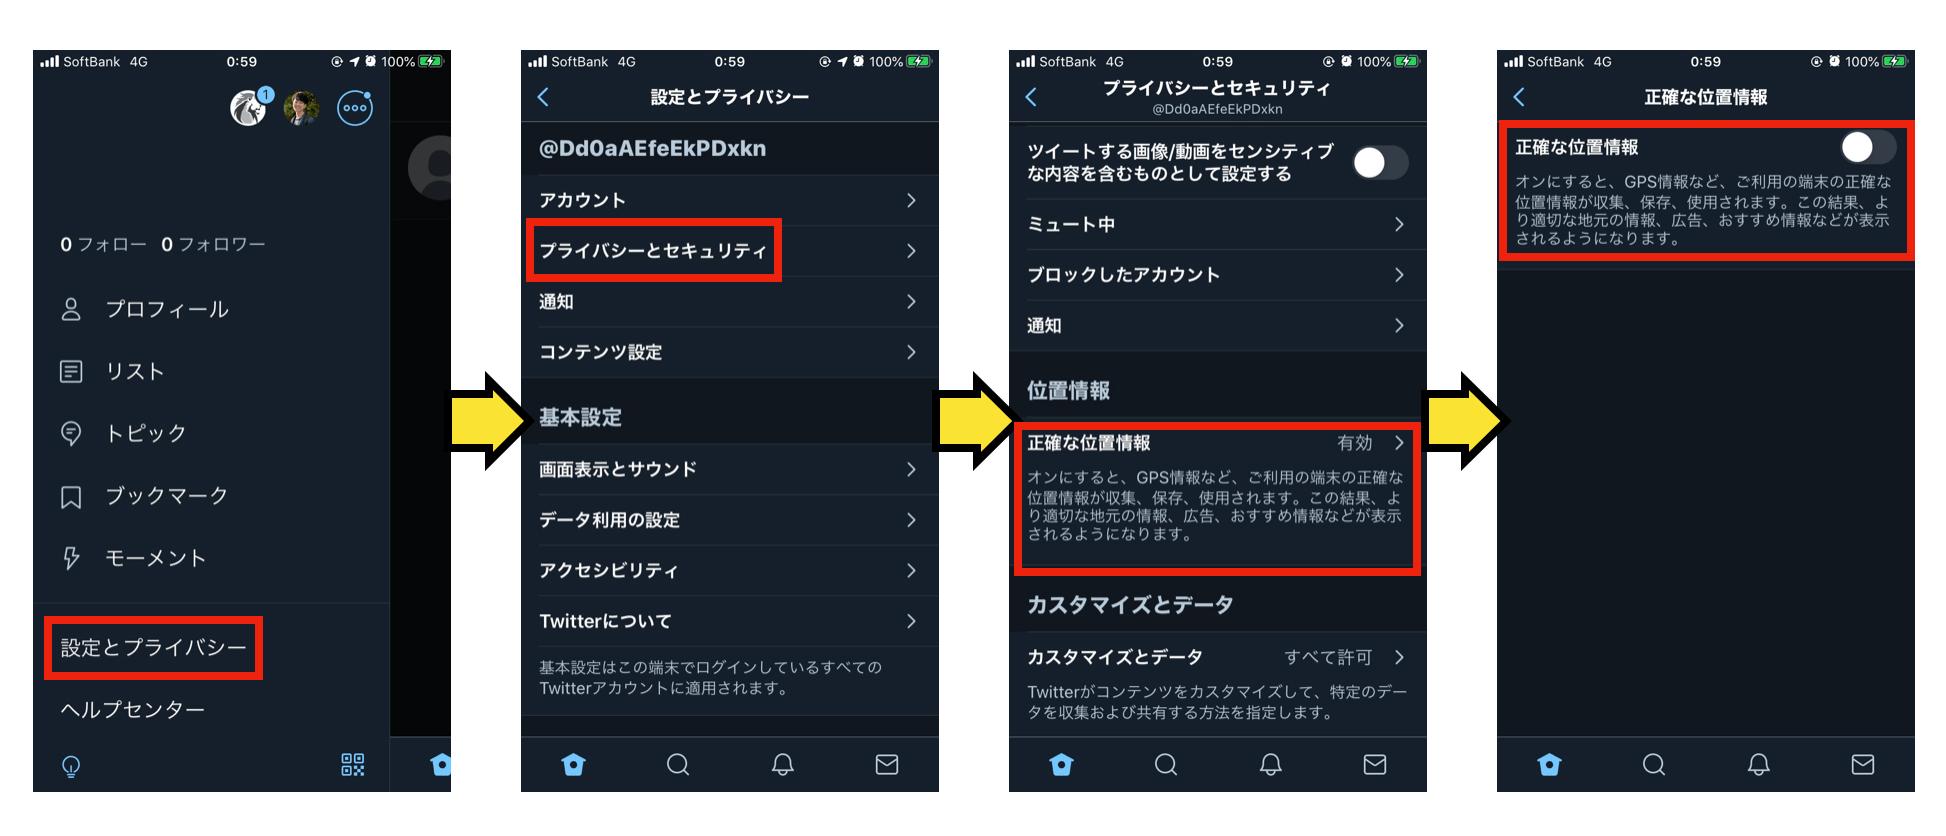 Twitterの位置情報をオフにする方法